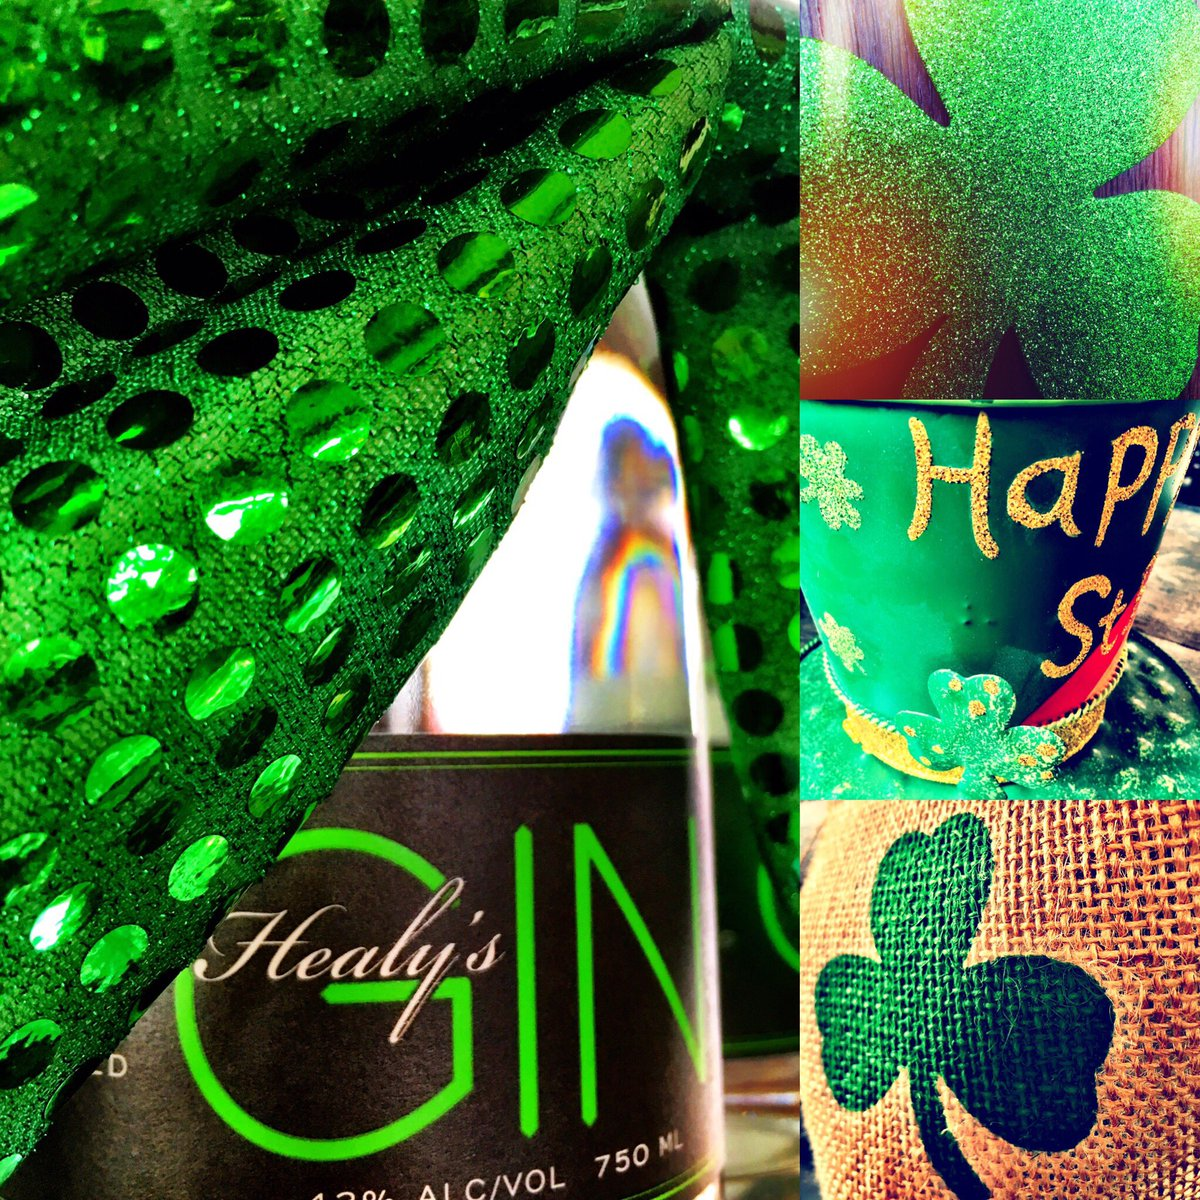 Gearing up for St. Patricks Day.. #healysgin #bestdamngin #greenisthenewgold #allthingsirishpic.twitter.com/Mmq9aZkpXD